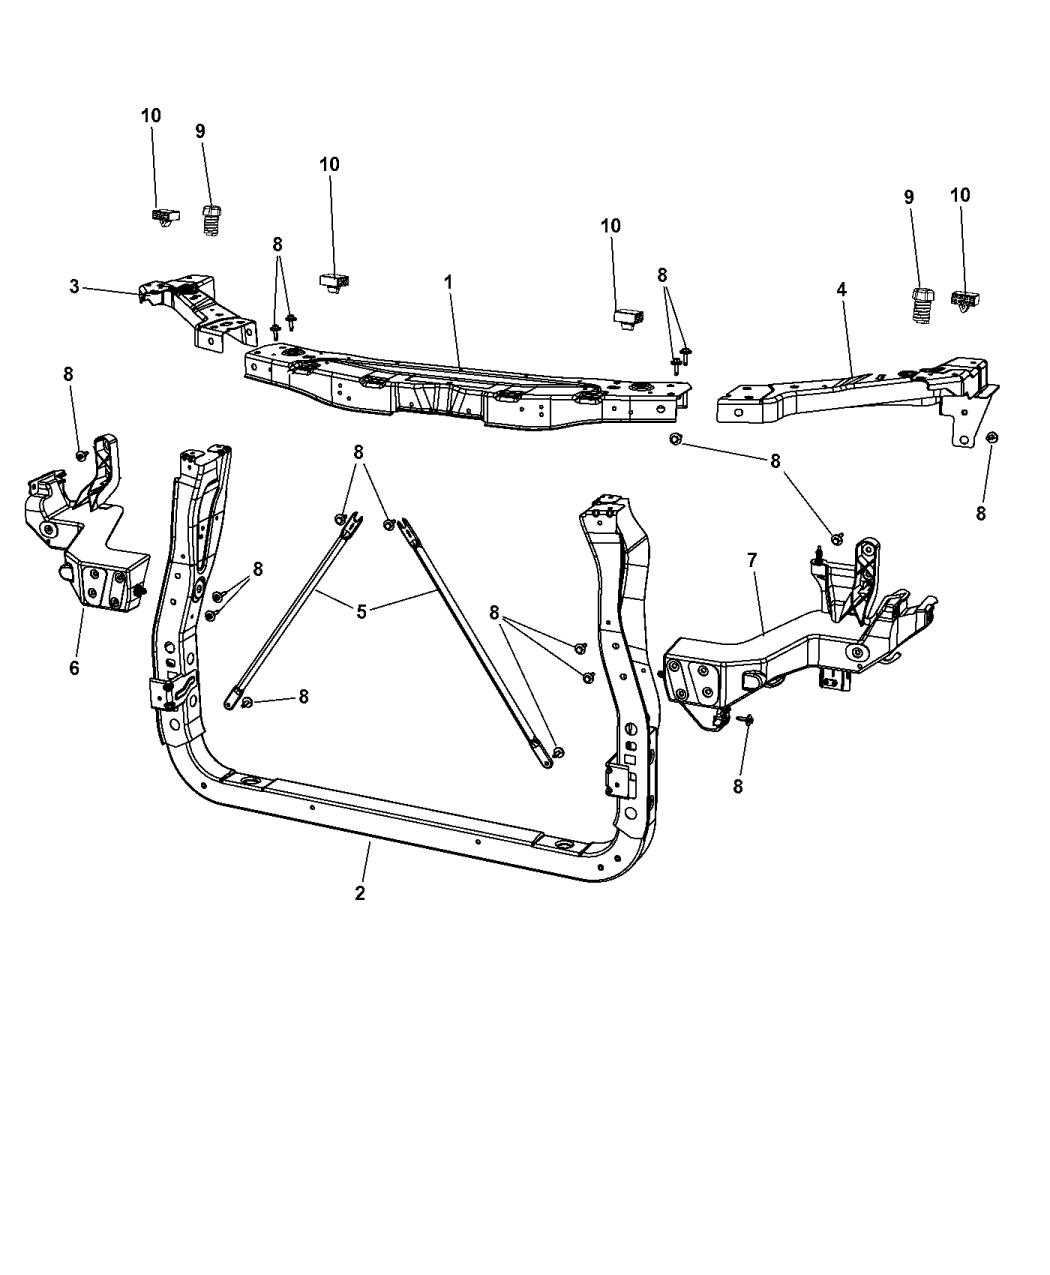 2015 Dodge Durango Radiator Support